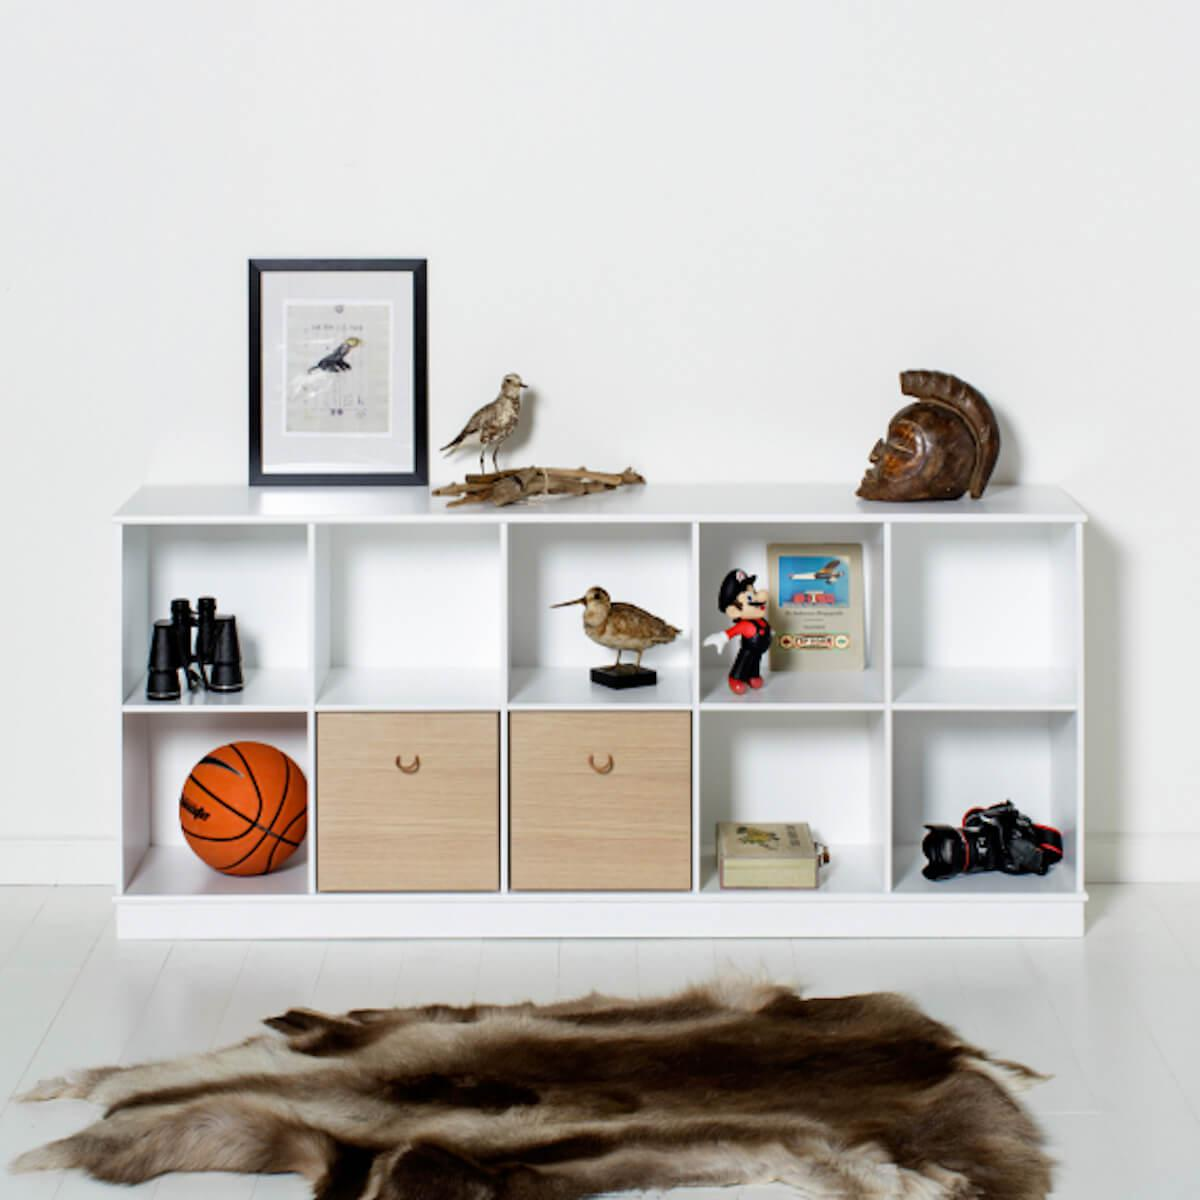 Estantería 174x78cm WOOD Oliver Furniture blanco